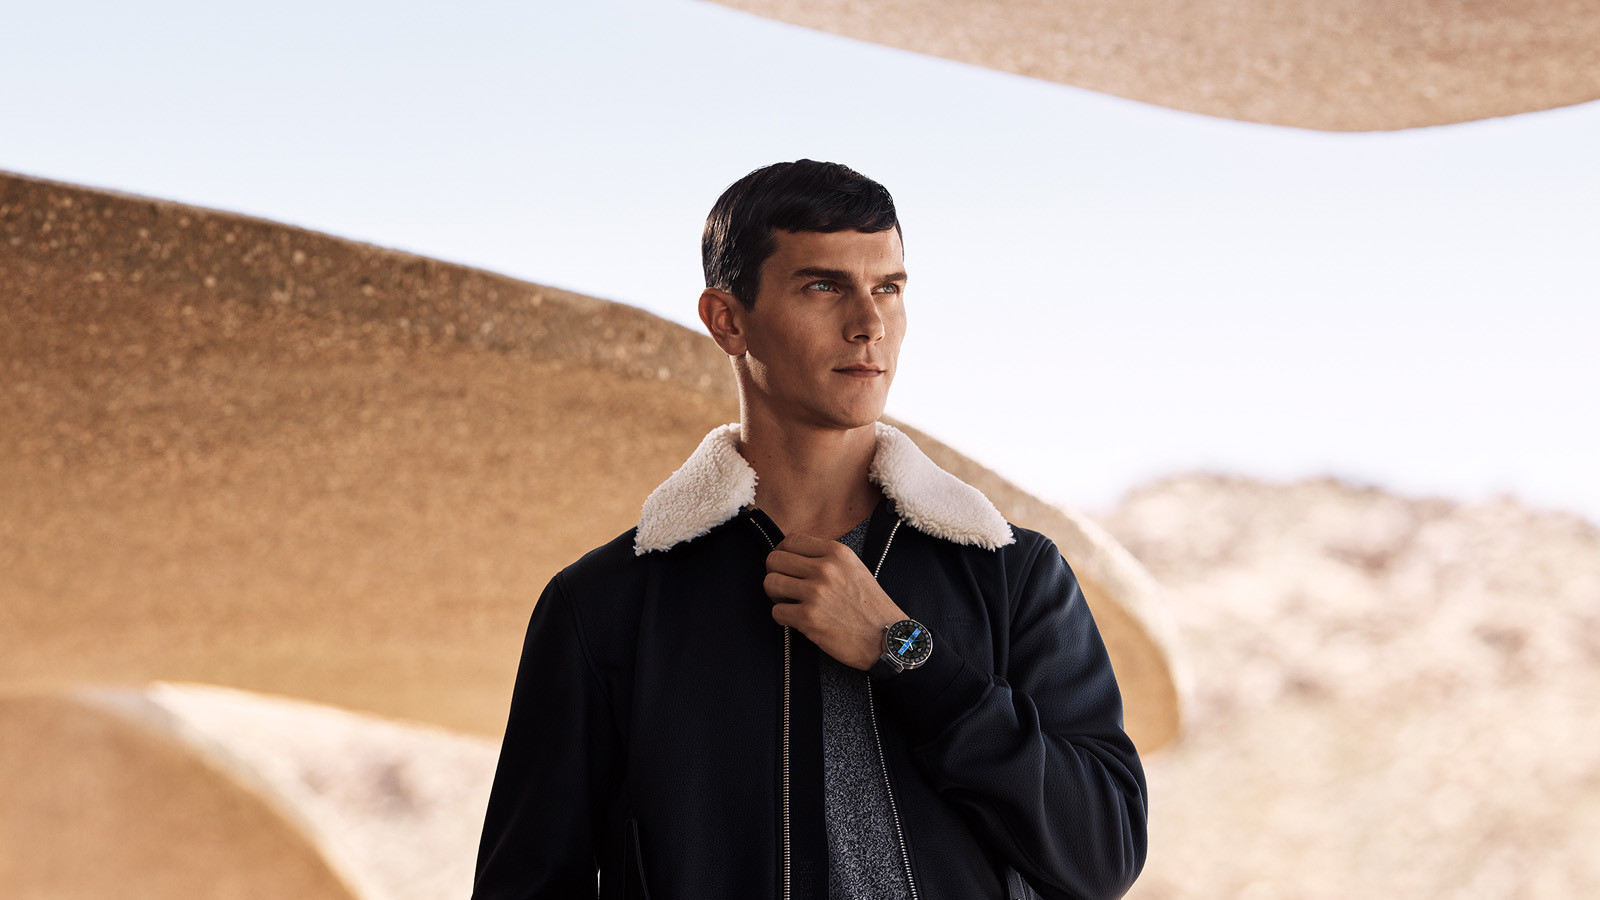 Louis Vuitton Tambout Horizon timepiece campaign